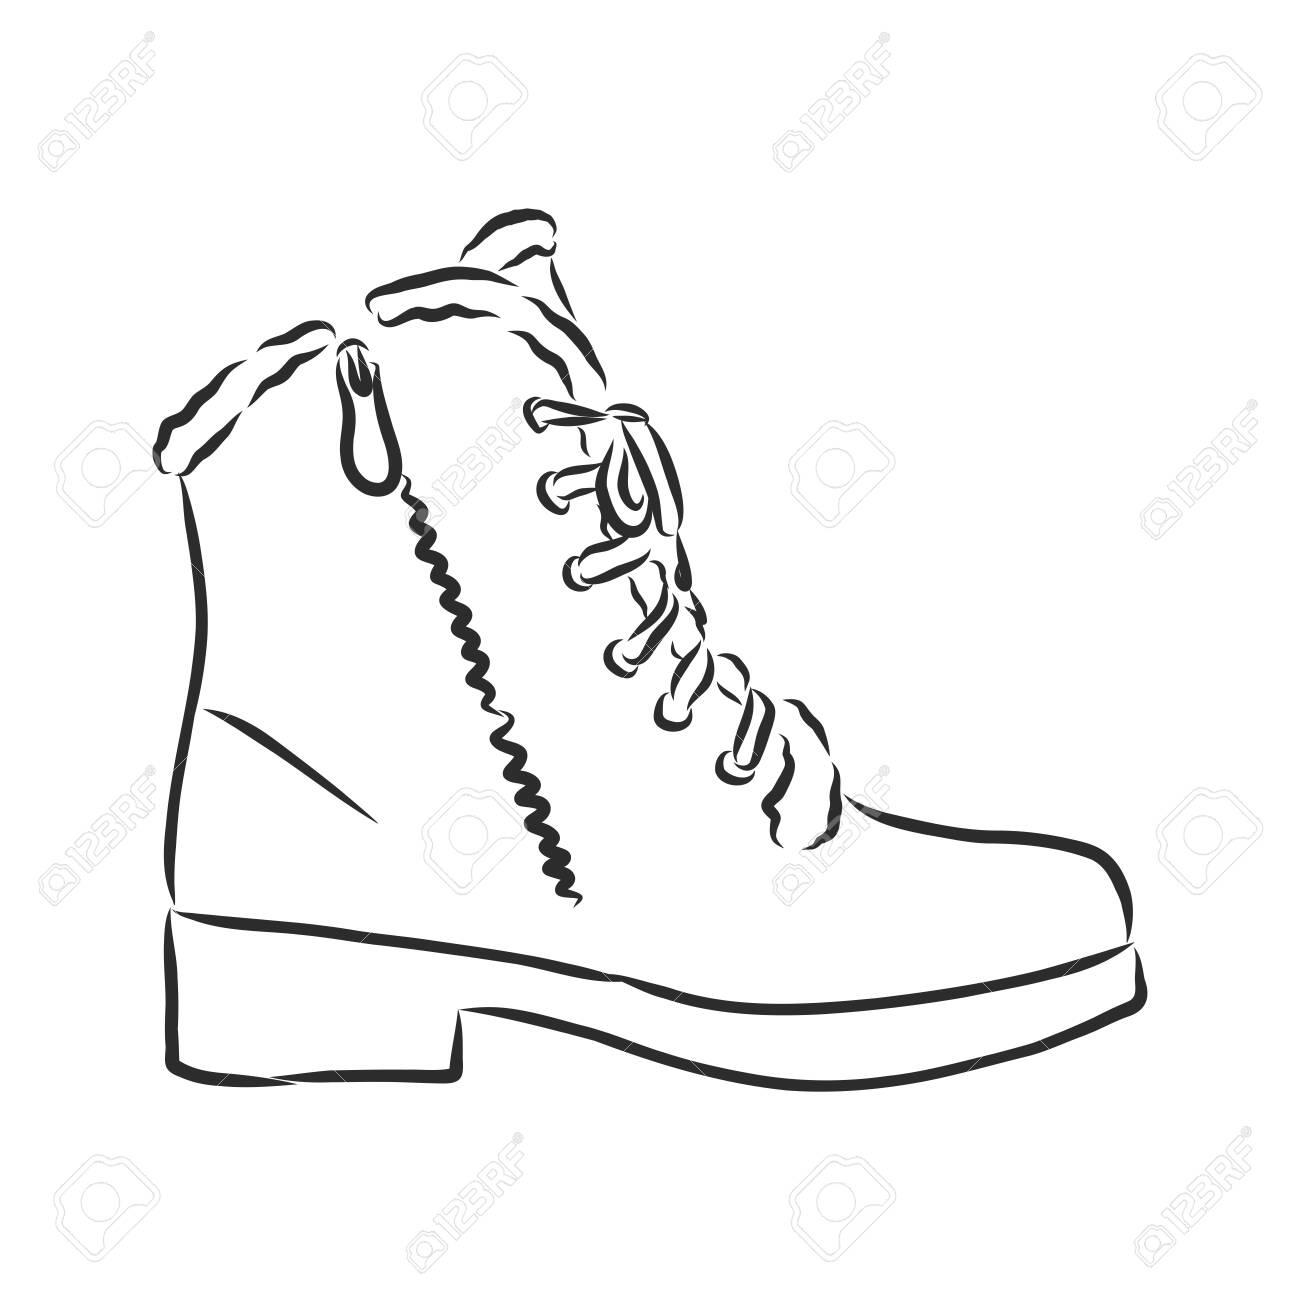 men's winter boots, winter shoes. vector sketch illustration - 139484072